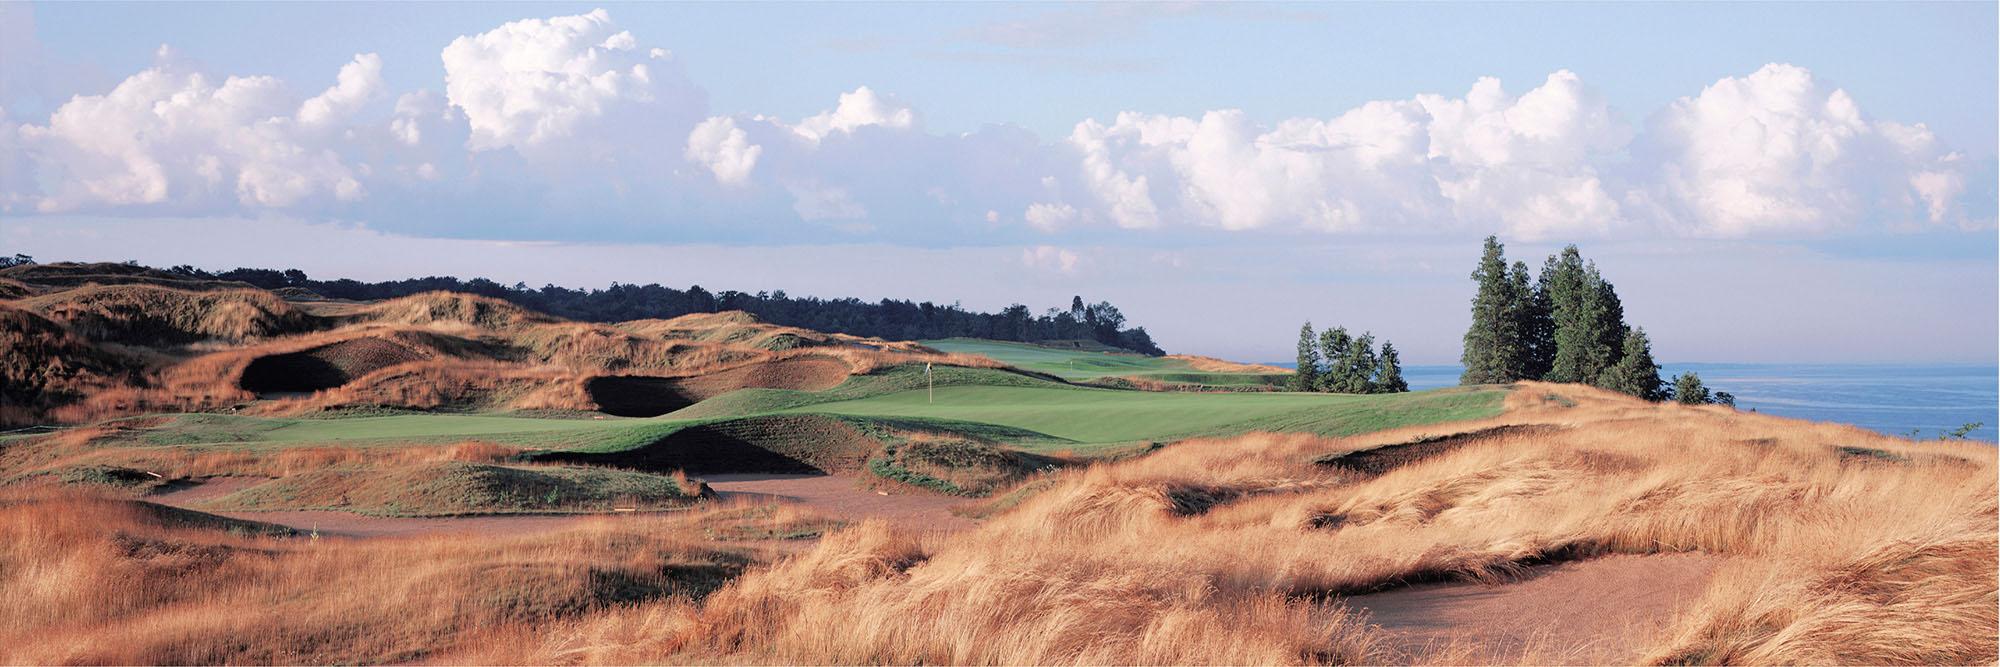 Golf Course Image - Arcadia Bluffs No. 5